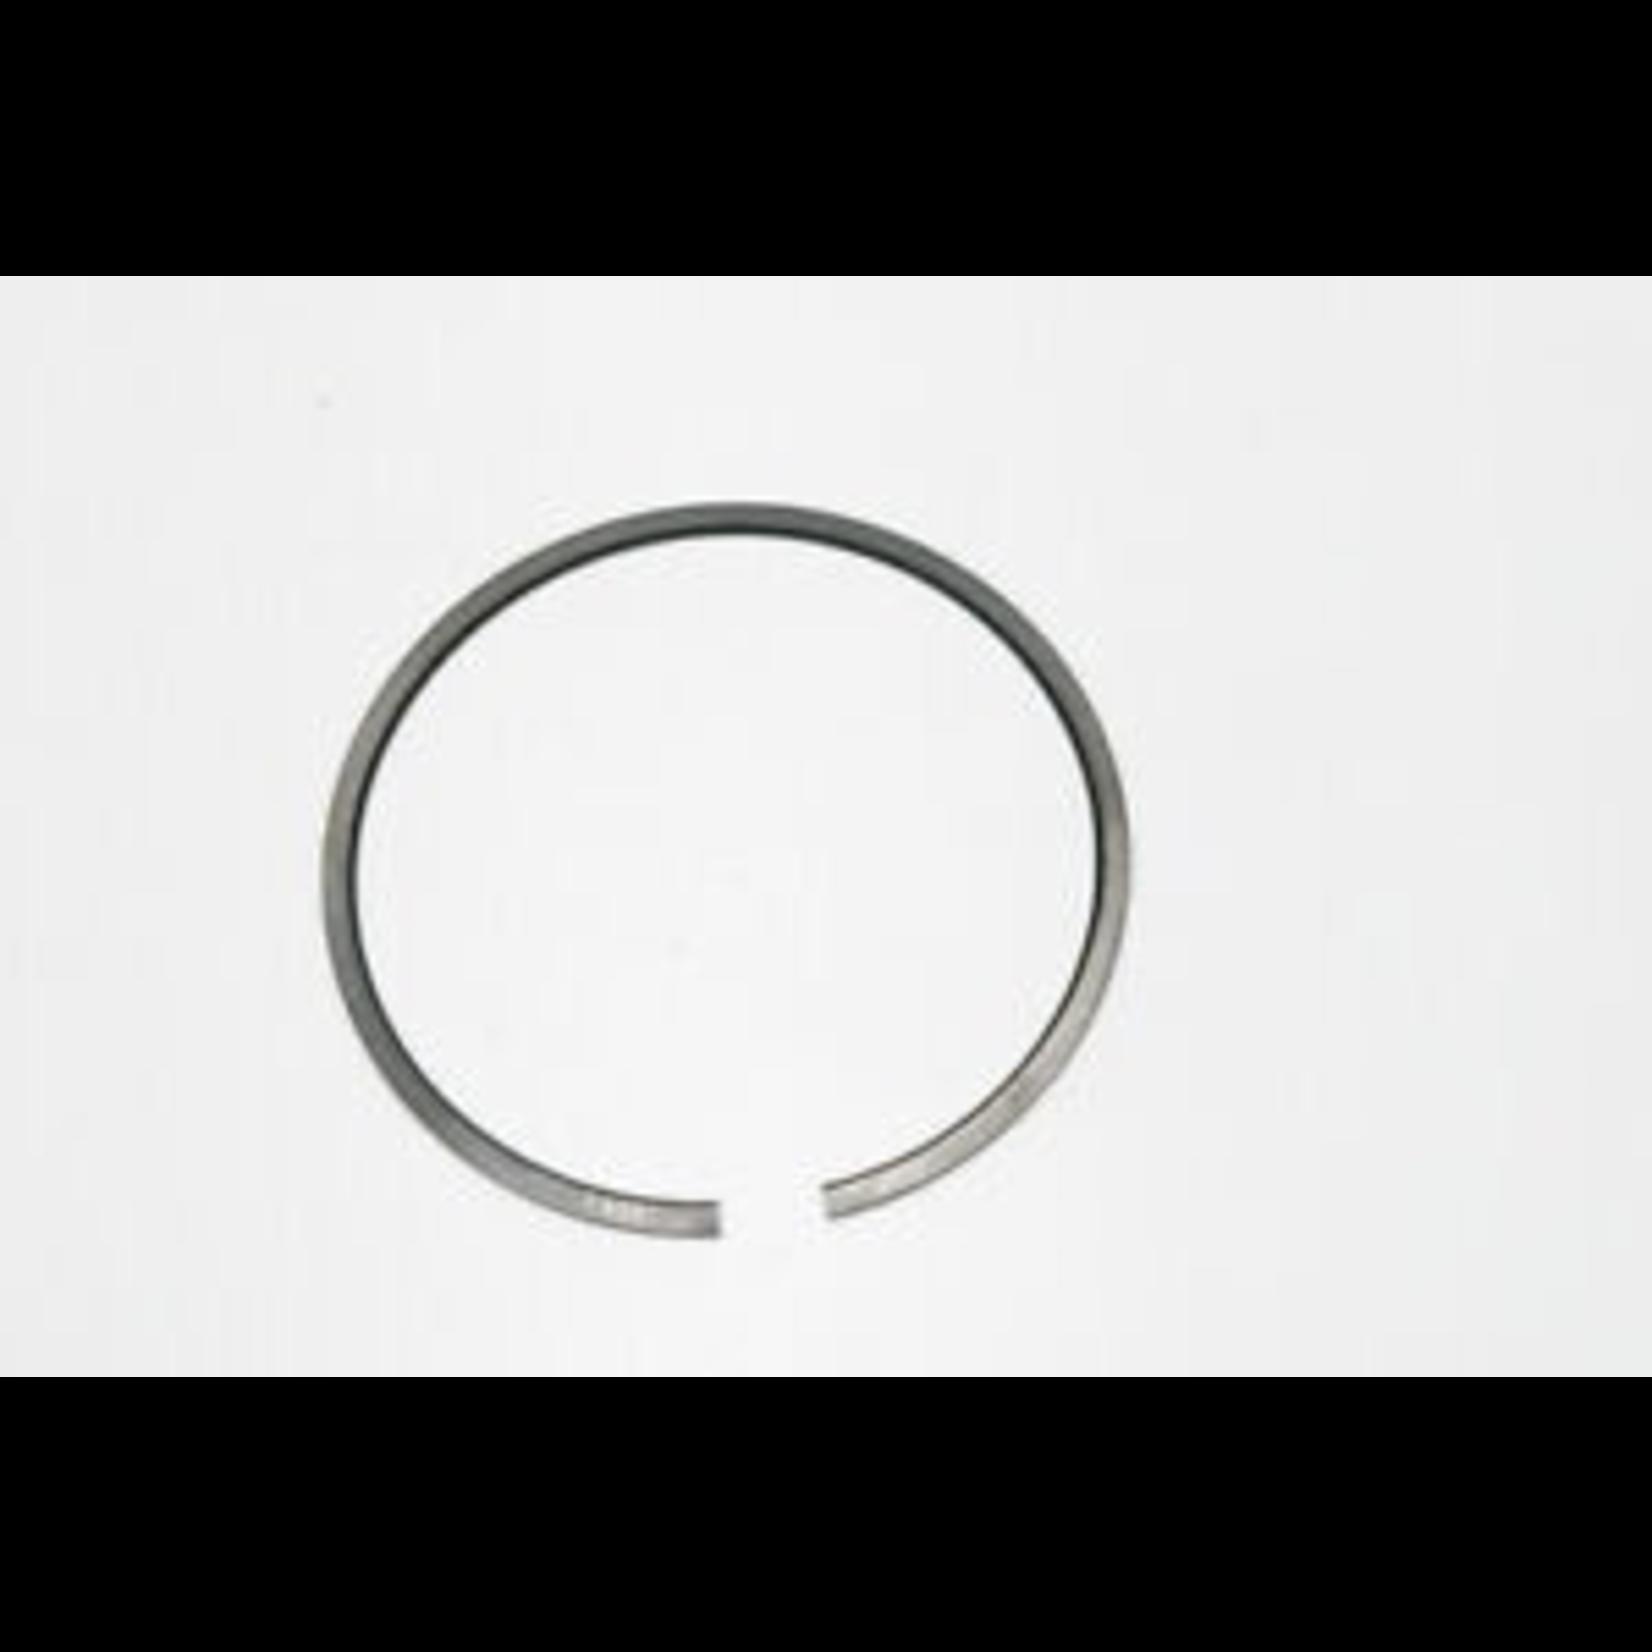 Parts Ring, Piston Compression BV350